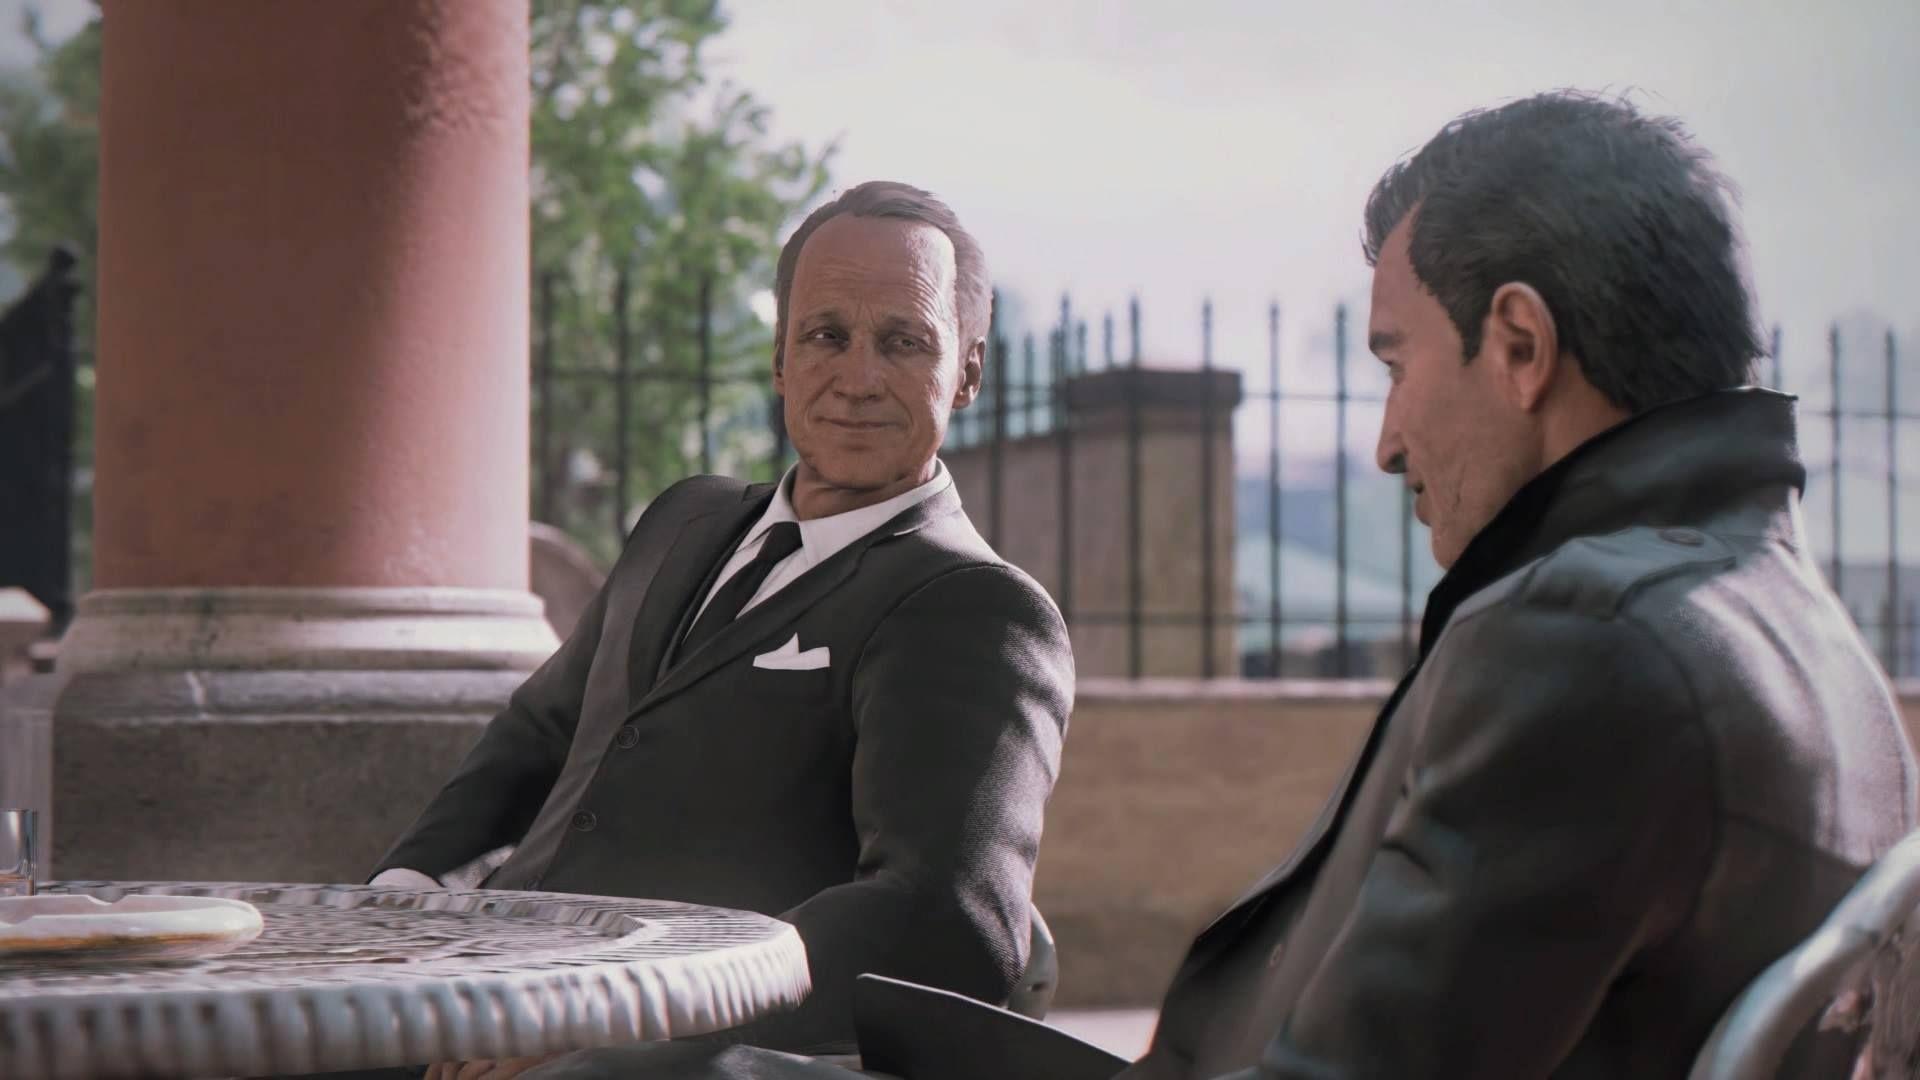 "Sam ""Sal"" Marcano y Vito Scaletta / MAFIA III (Mafia 3) / PS4Share #PC #PlayStation4 #PS4 #XboxOne #MAFIA #MAFIA3 #MAFIAIII #CosaNostra #MafiaGame #PS4Share #SalMarcano #SamMarcano #VitoScaletta"